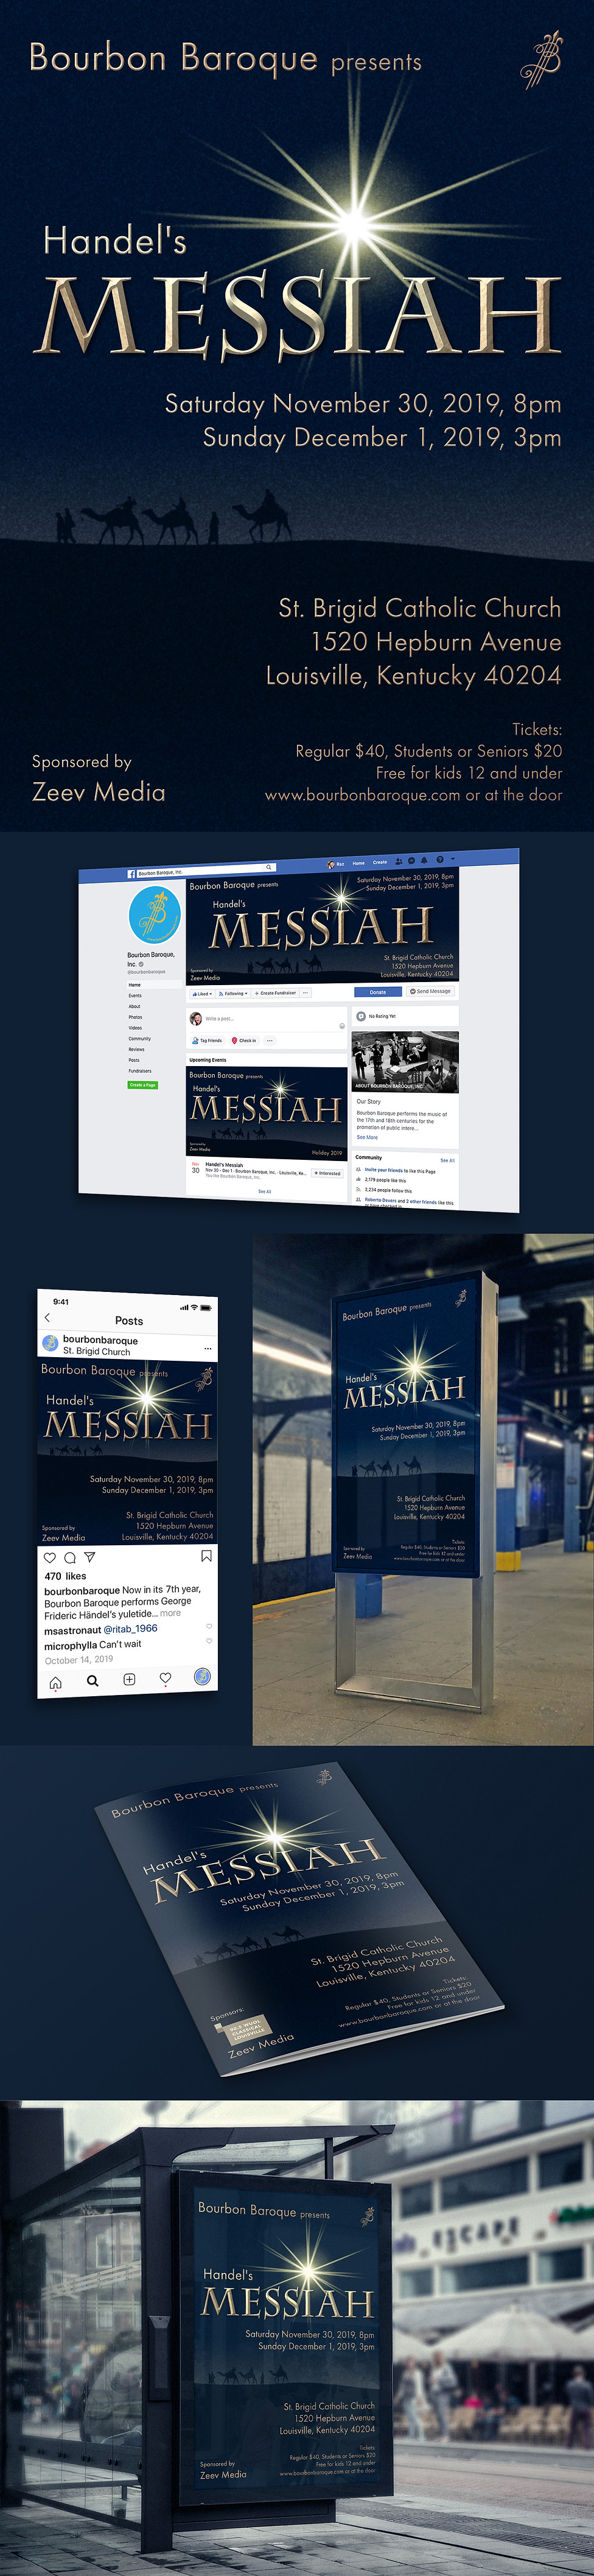 Messiah 2019